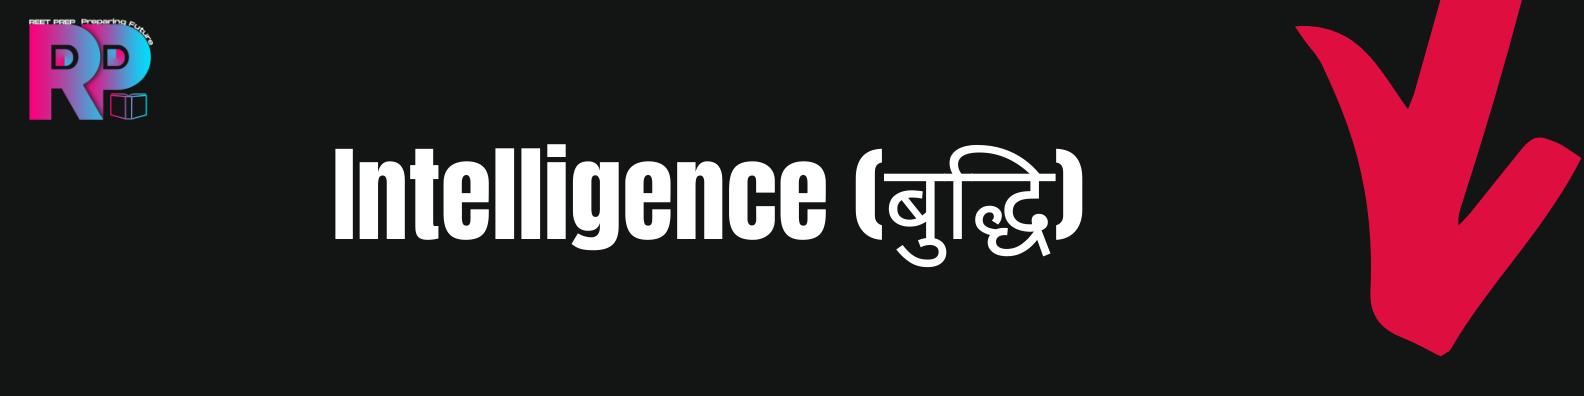 Intelligence(बुद्धि)